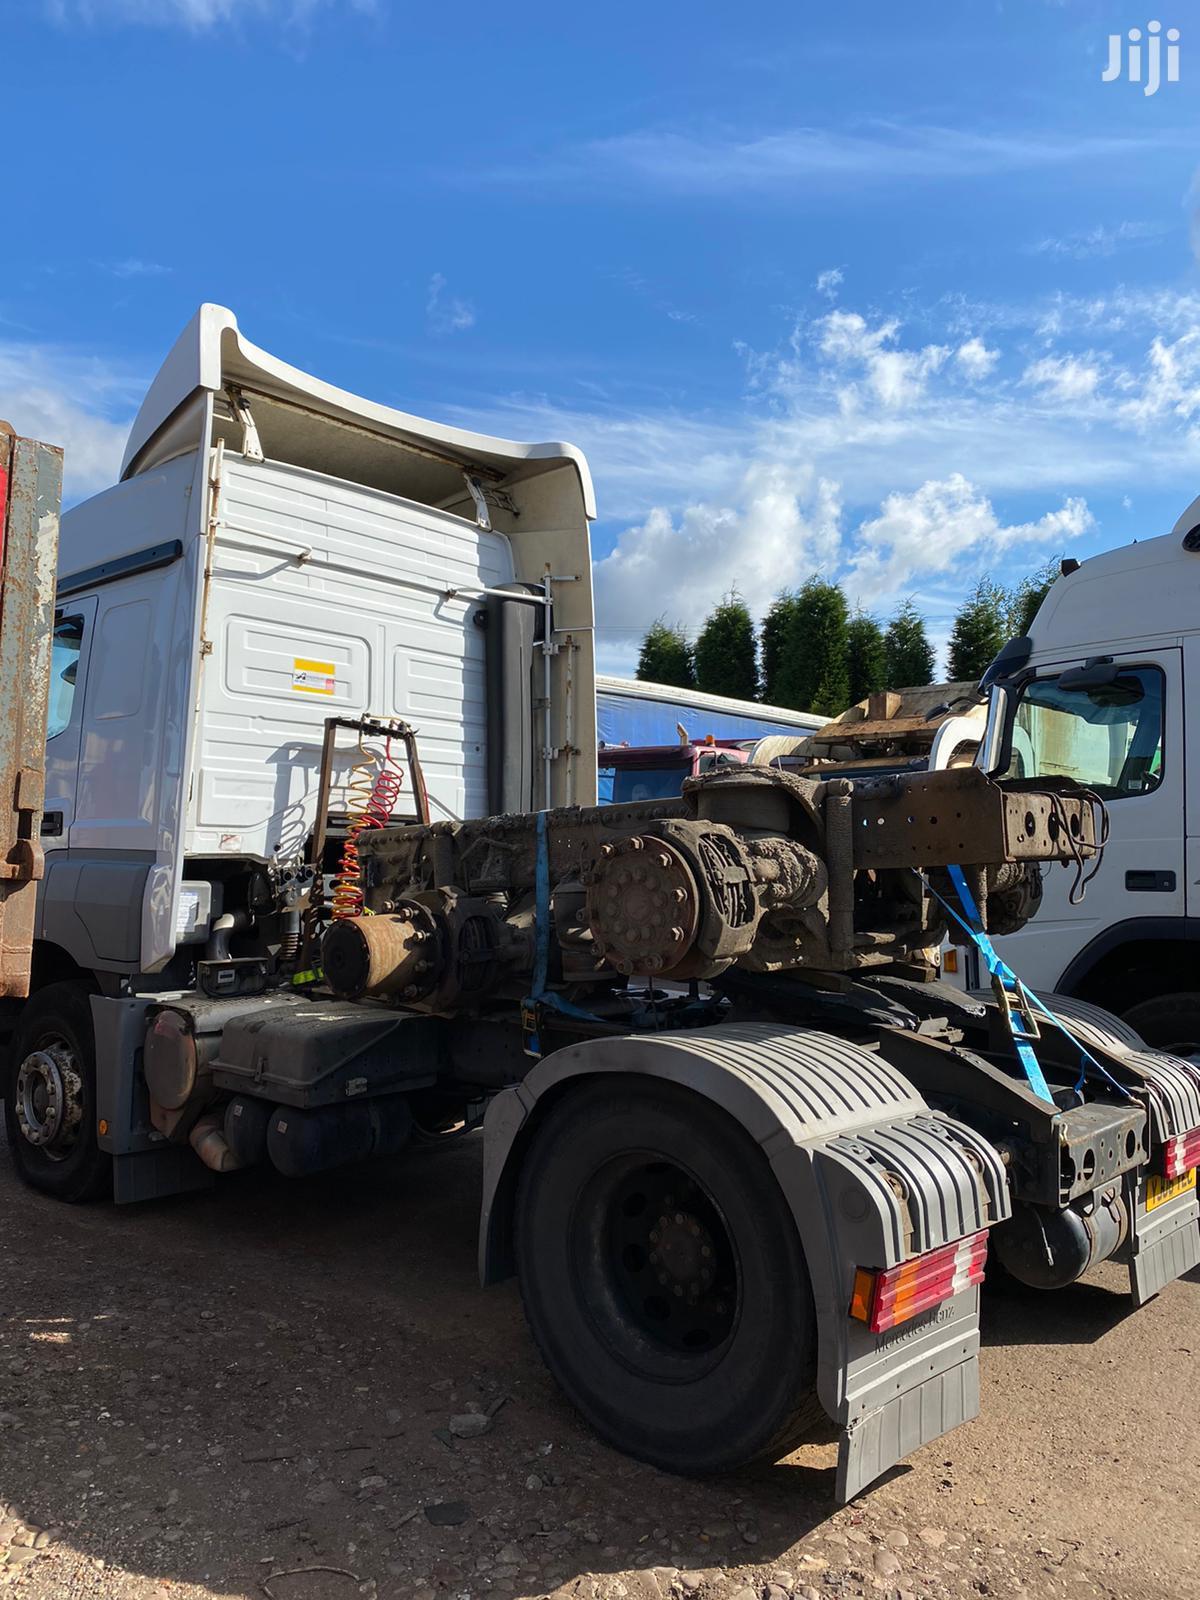 Mercedes-Benz CHESSES NO Model Name 1843 Axor   Trucks & Trailers for sale in Ilala, Dar es Salaam, Tanzania